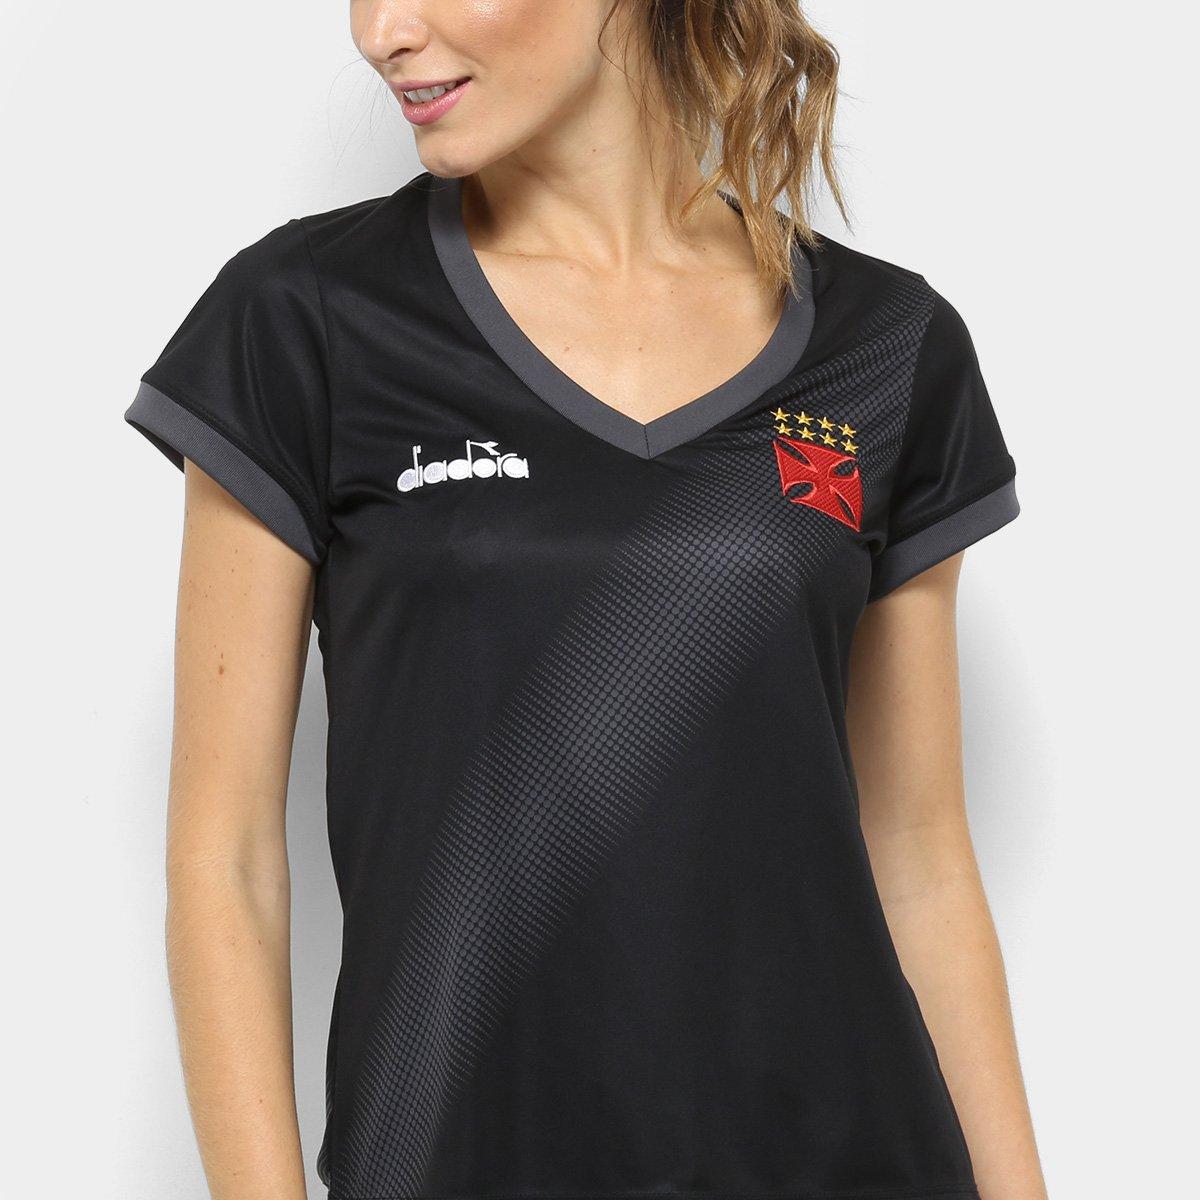 ... Feminina Camisa Camisa Vasco 2018 Vasco Preto Diadora Aquecimento YTaw7f 0fb952c6712db